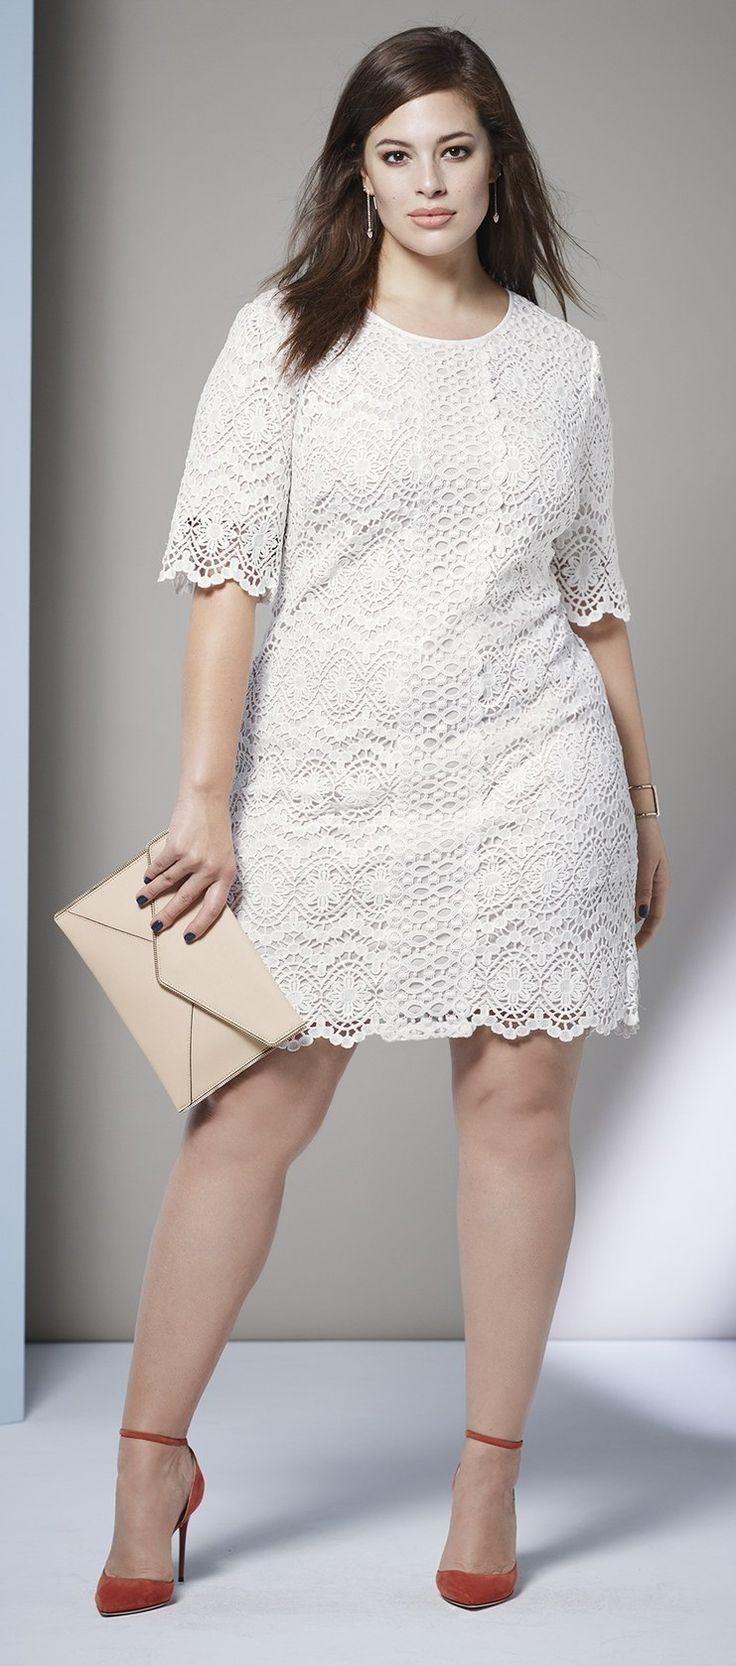 Ropa plus Más Clothing, Shoes & Jewelry - Women - Plus-Size - Wantdo - women big size clothes - http://amzn.to/2lfaYAF